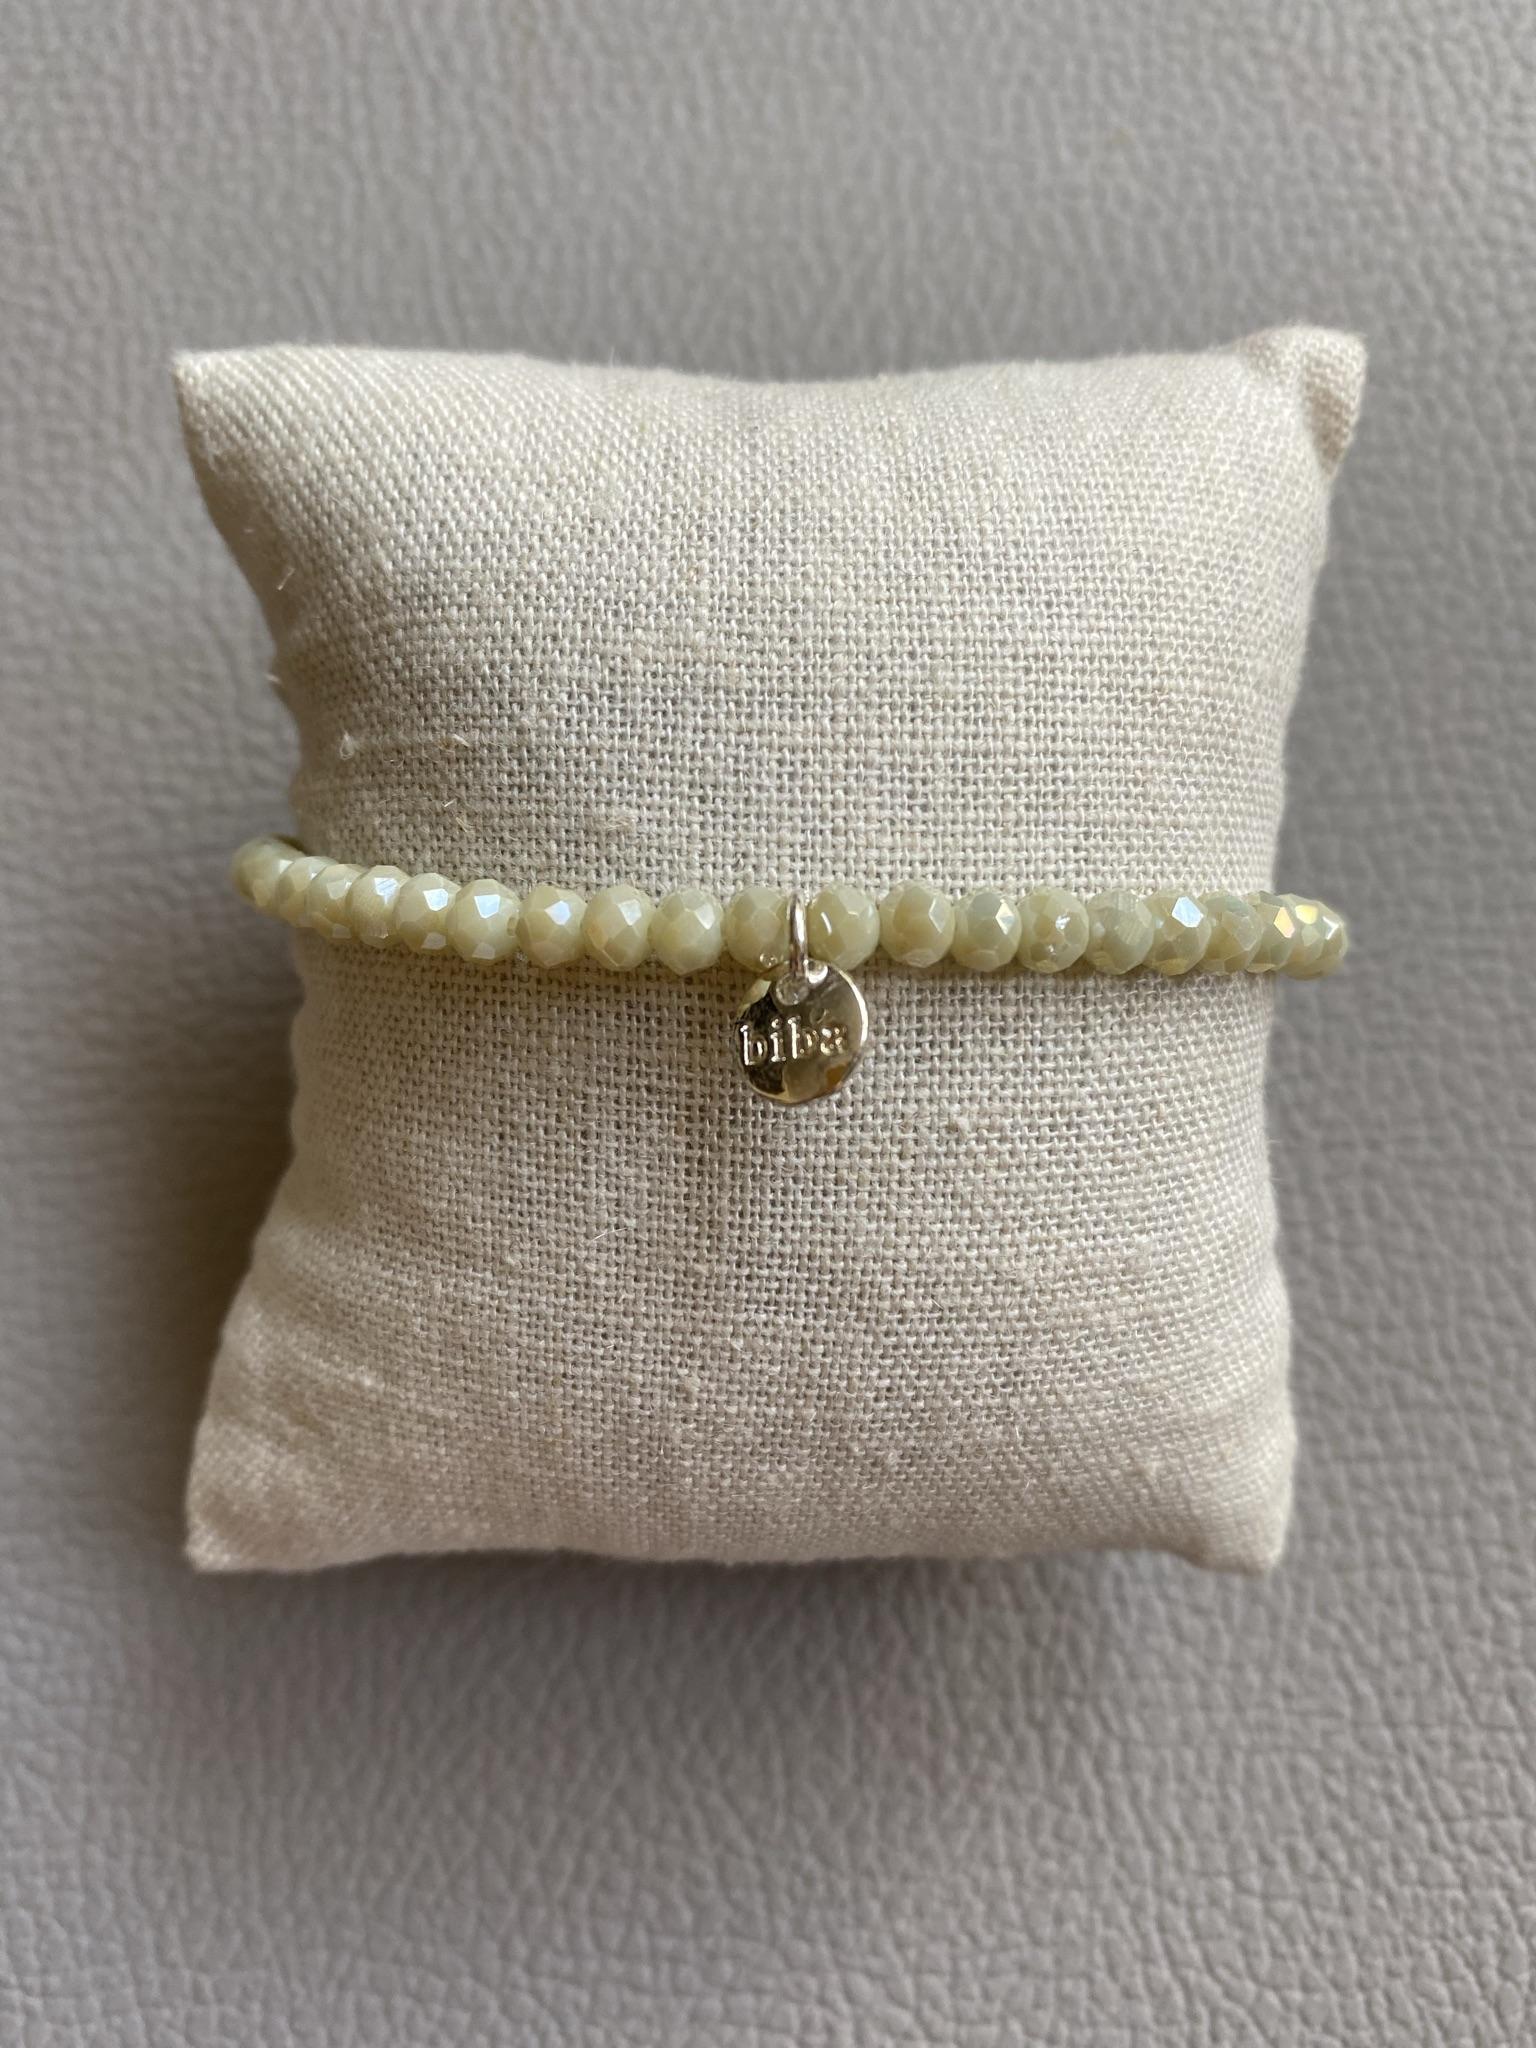 Biba Armband weiß/cremé silber